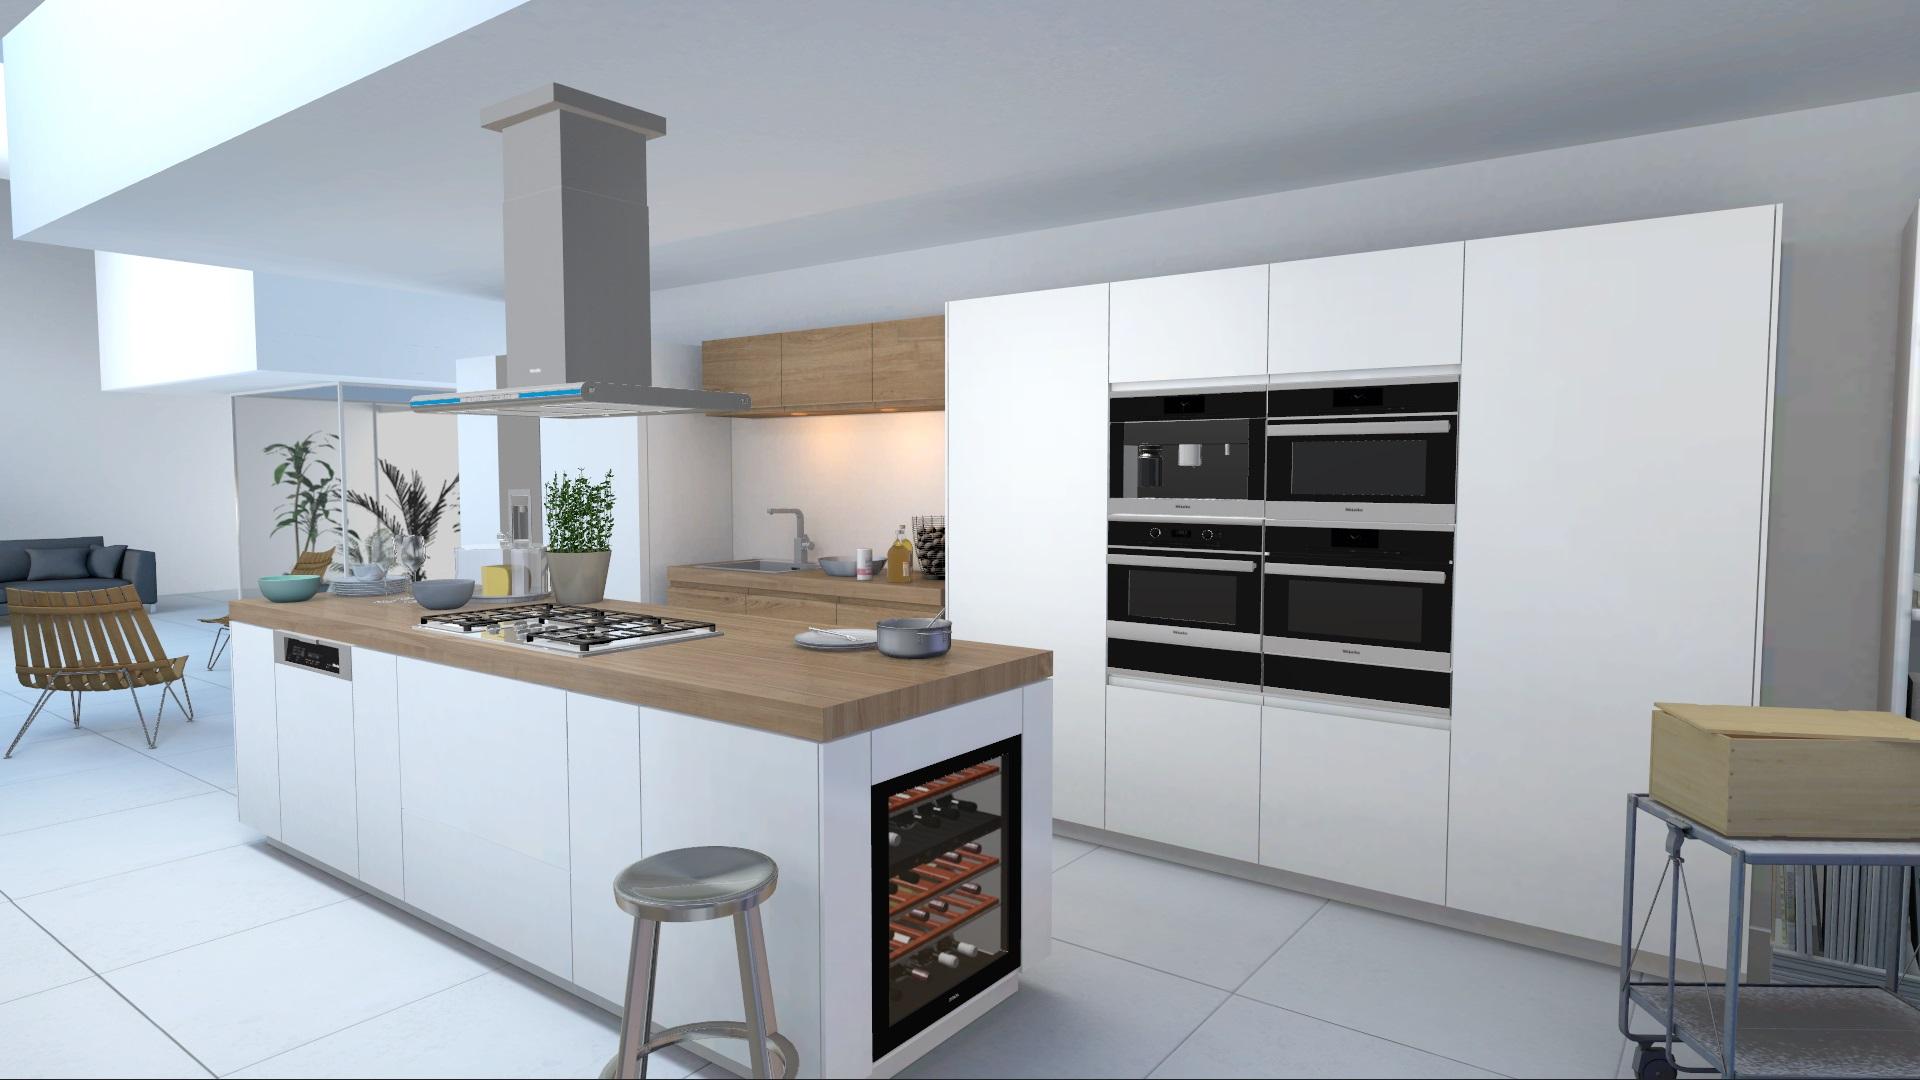 Kitchen Appliance Visualizer Redplant Realtime Studio